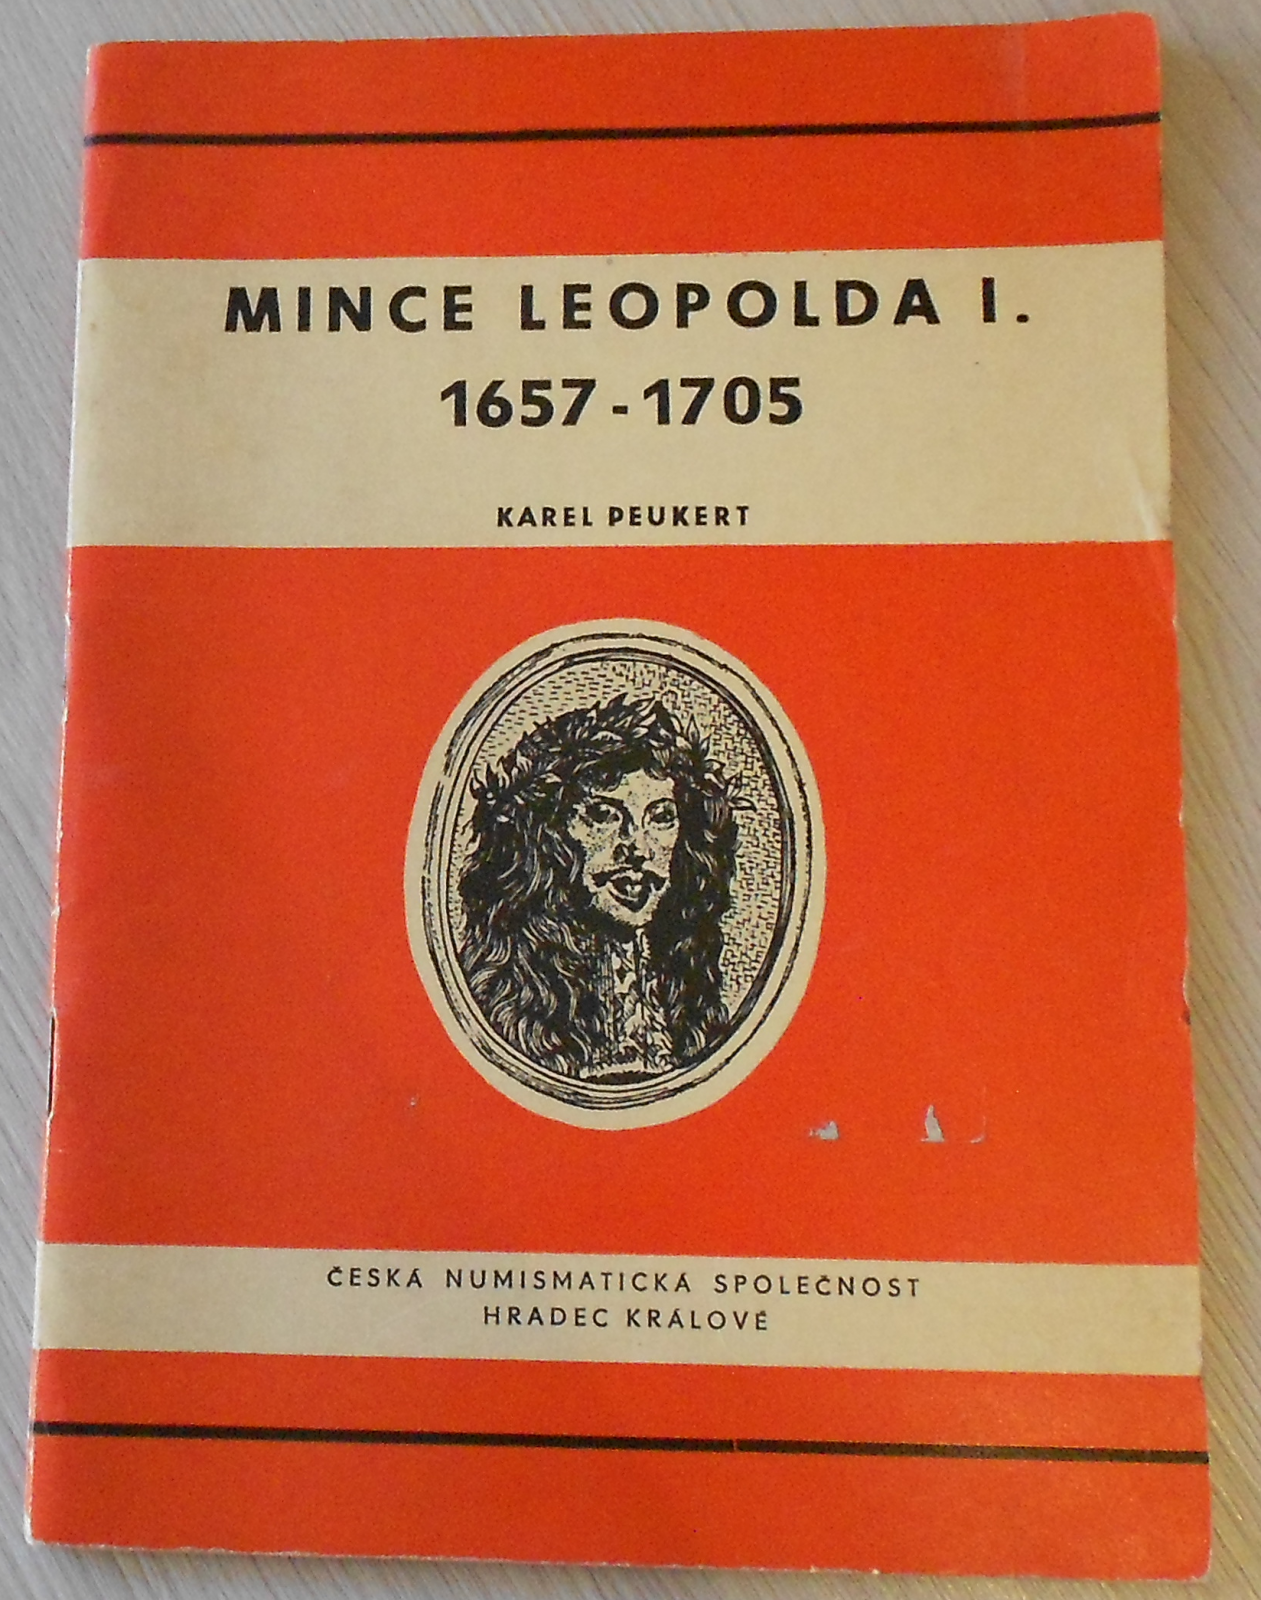 Mince Leopolda I., Karel Paukert, 46 stran